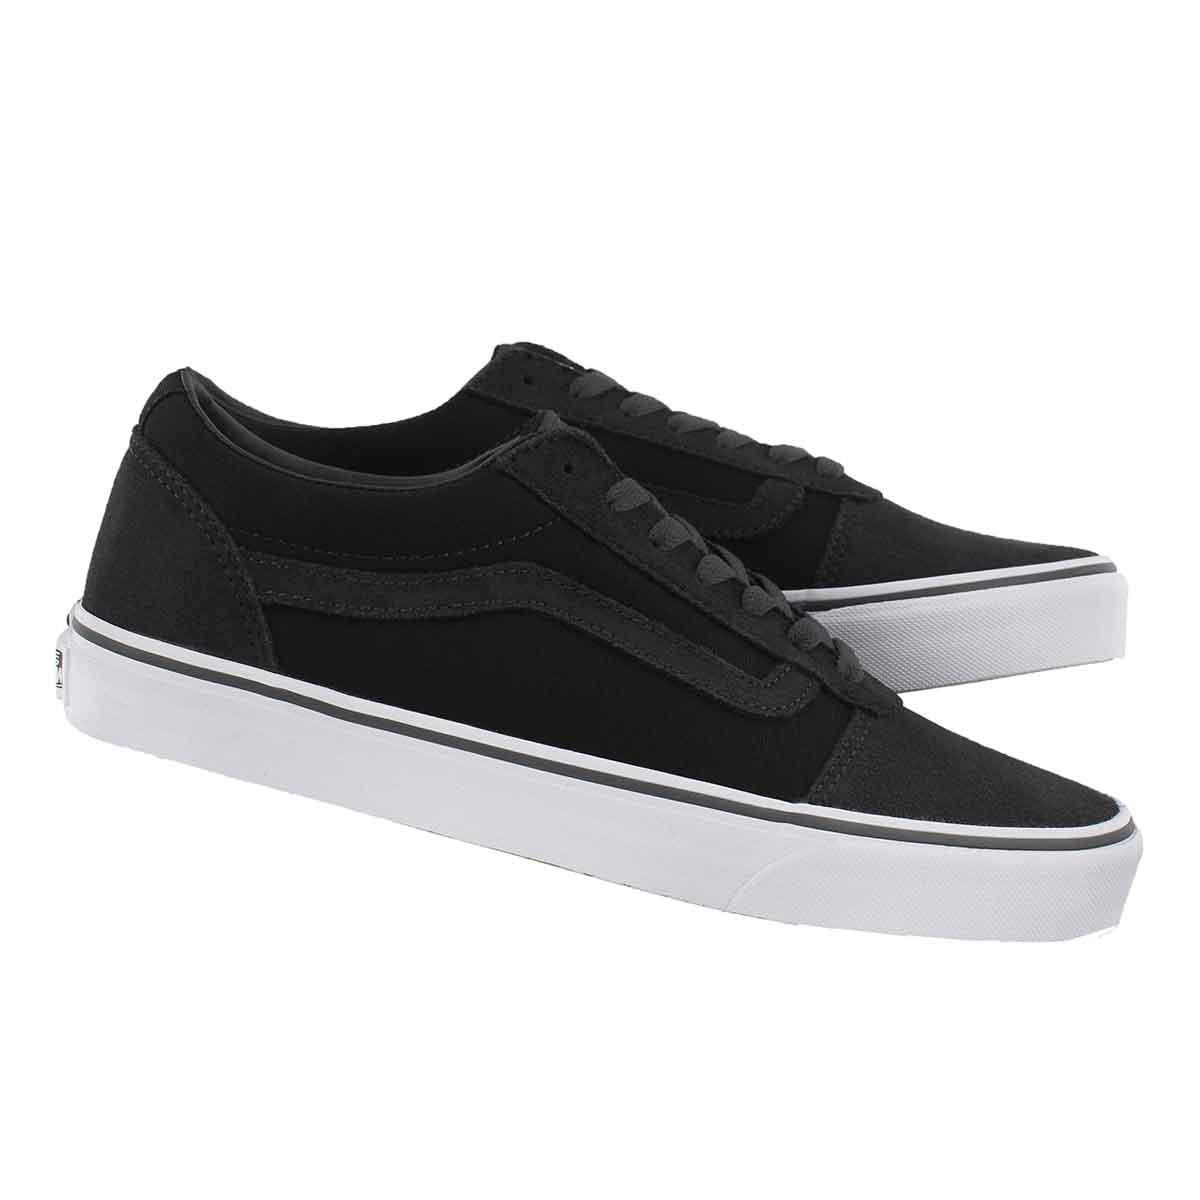 Mns Ward blk/asphalt lace up sneaker